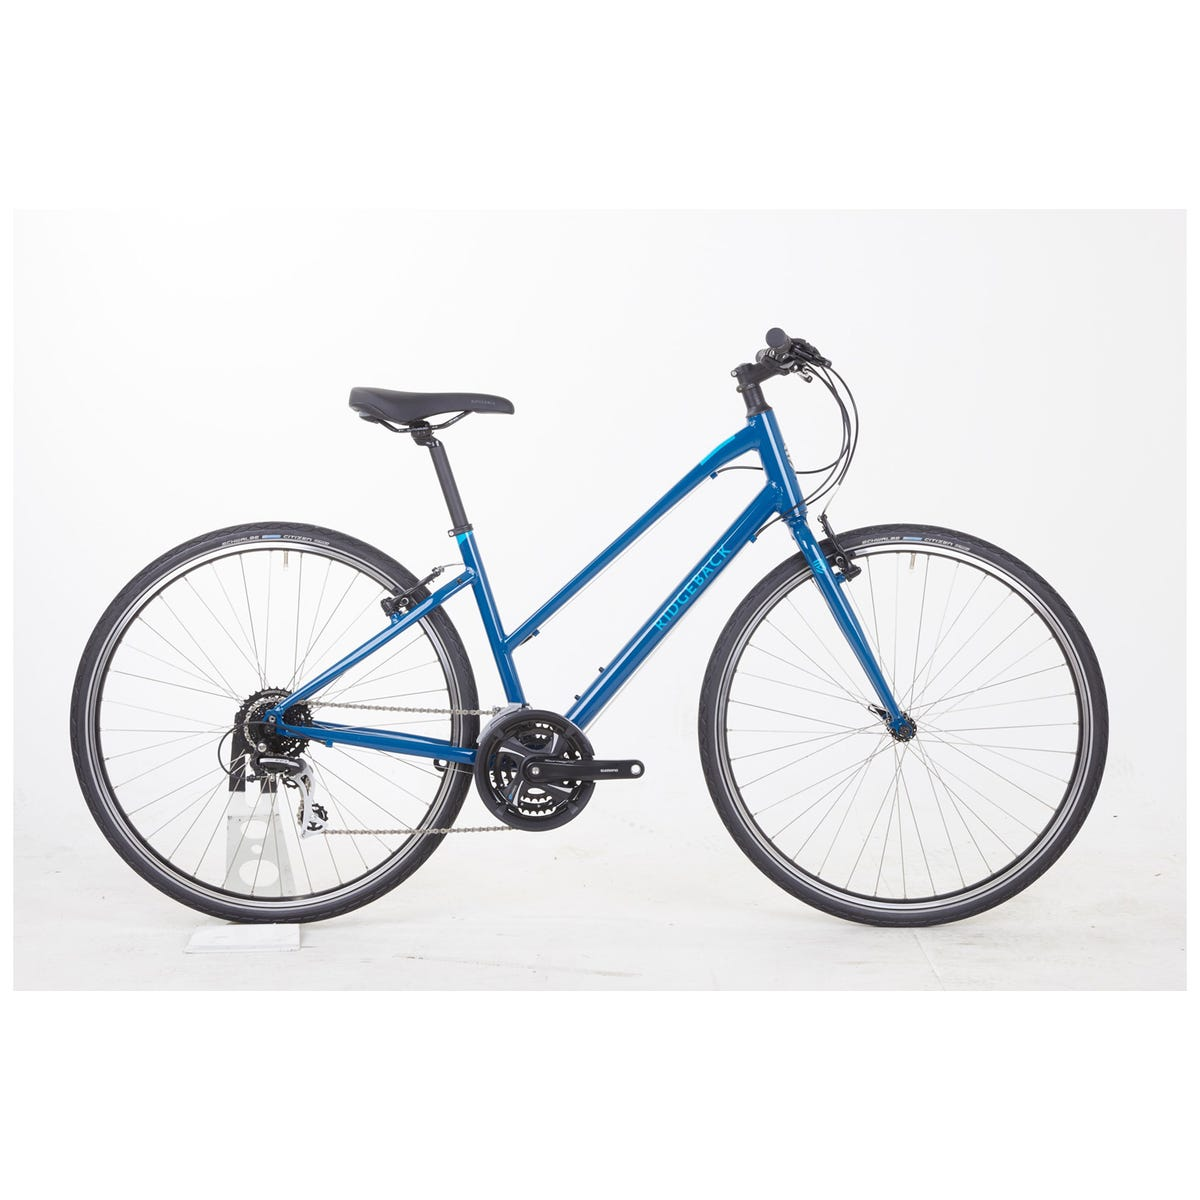 Ridgeback Velocity Open Frame Medium Sample Bike (Used)